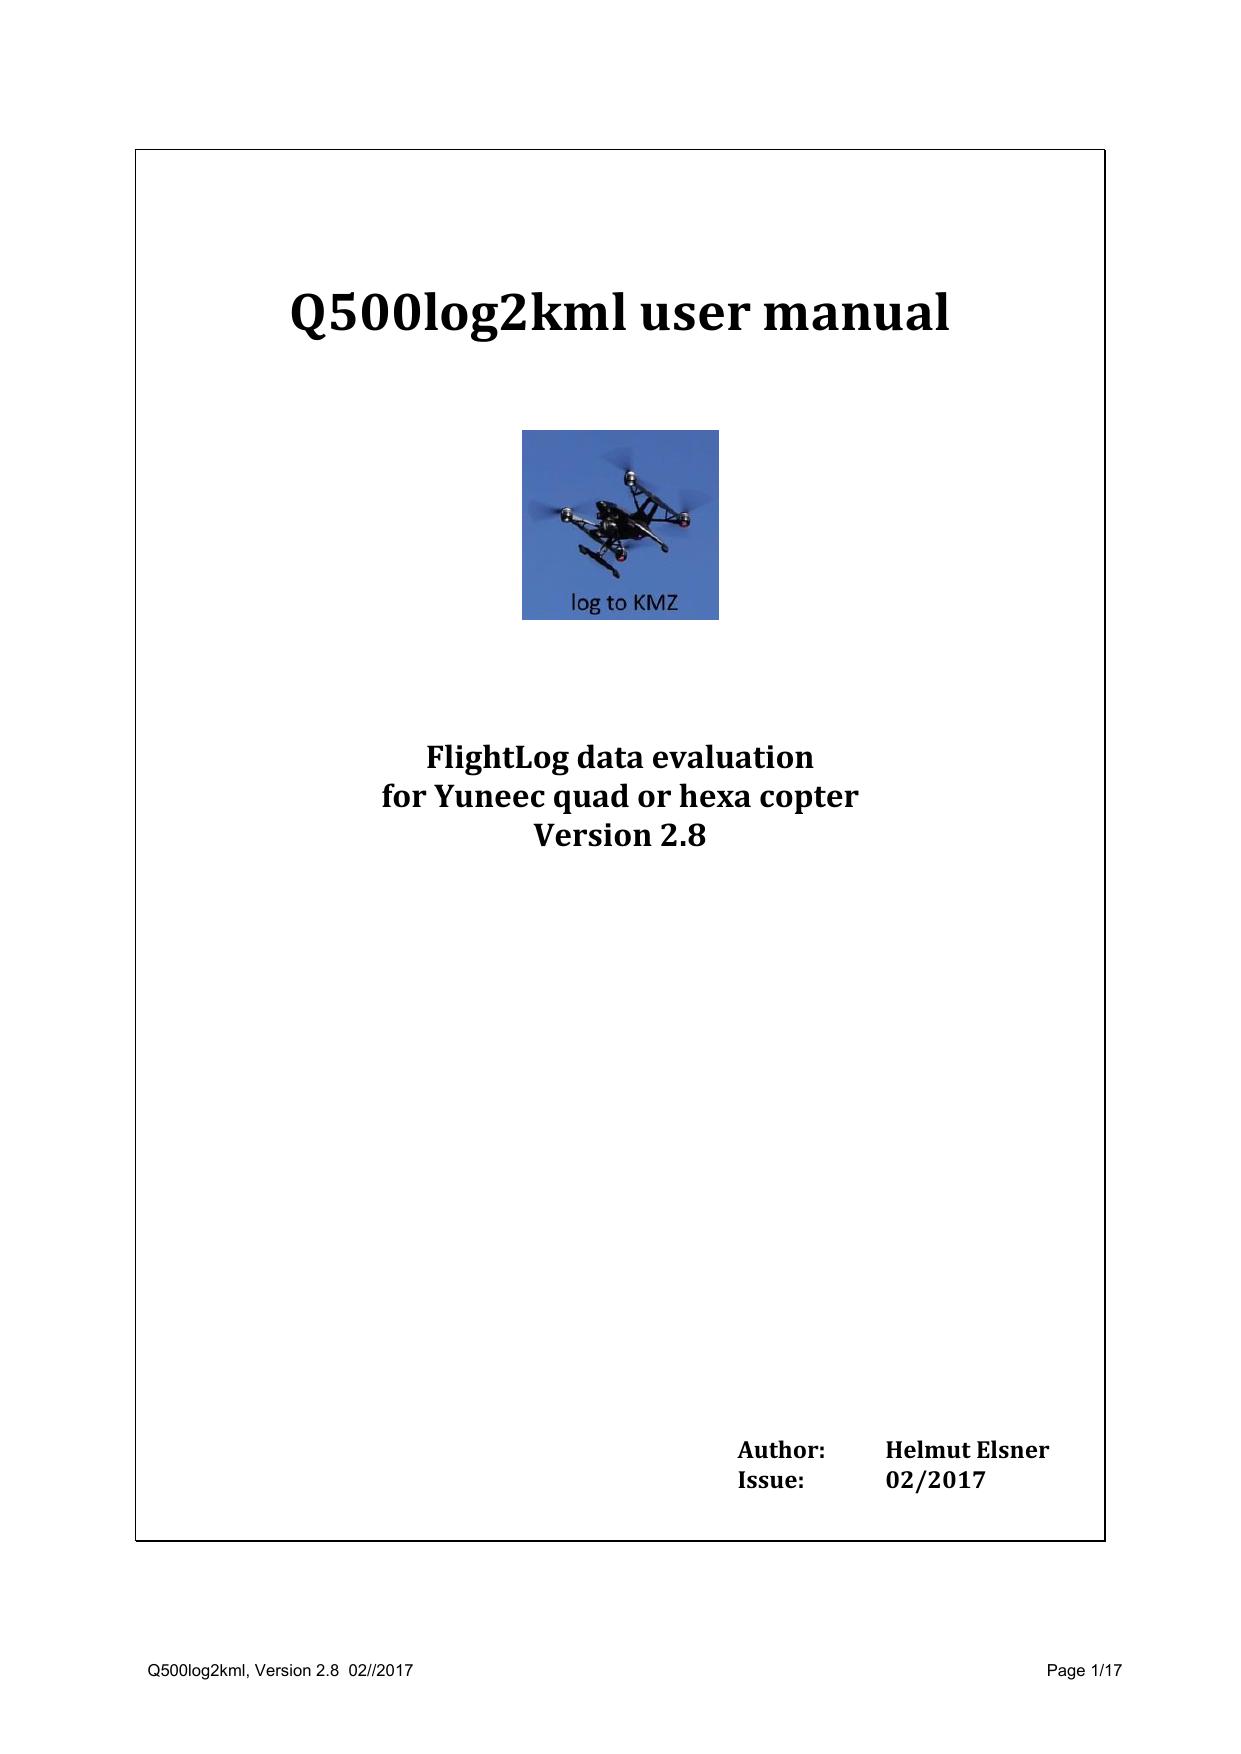 Q500log2kml user manual - b | manualzz com